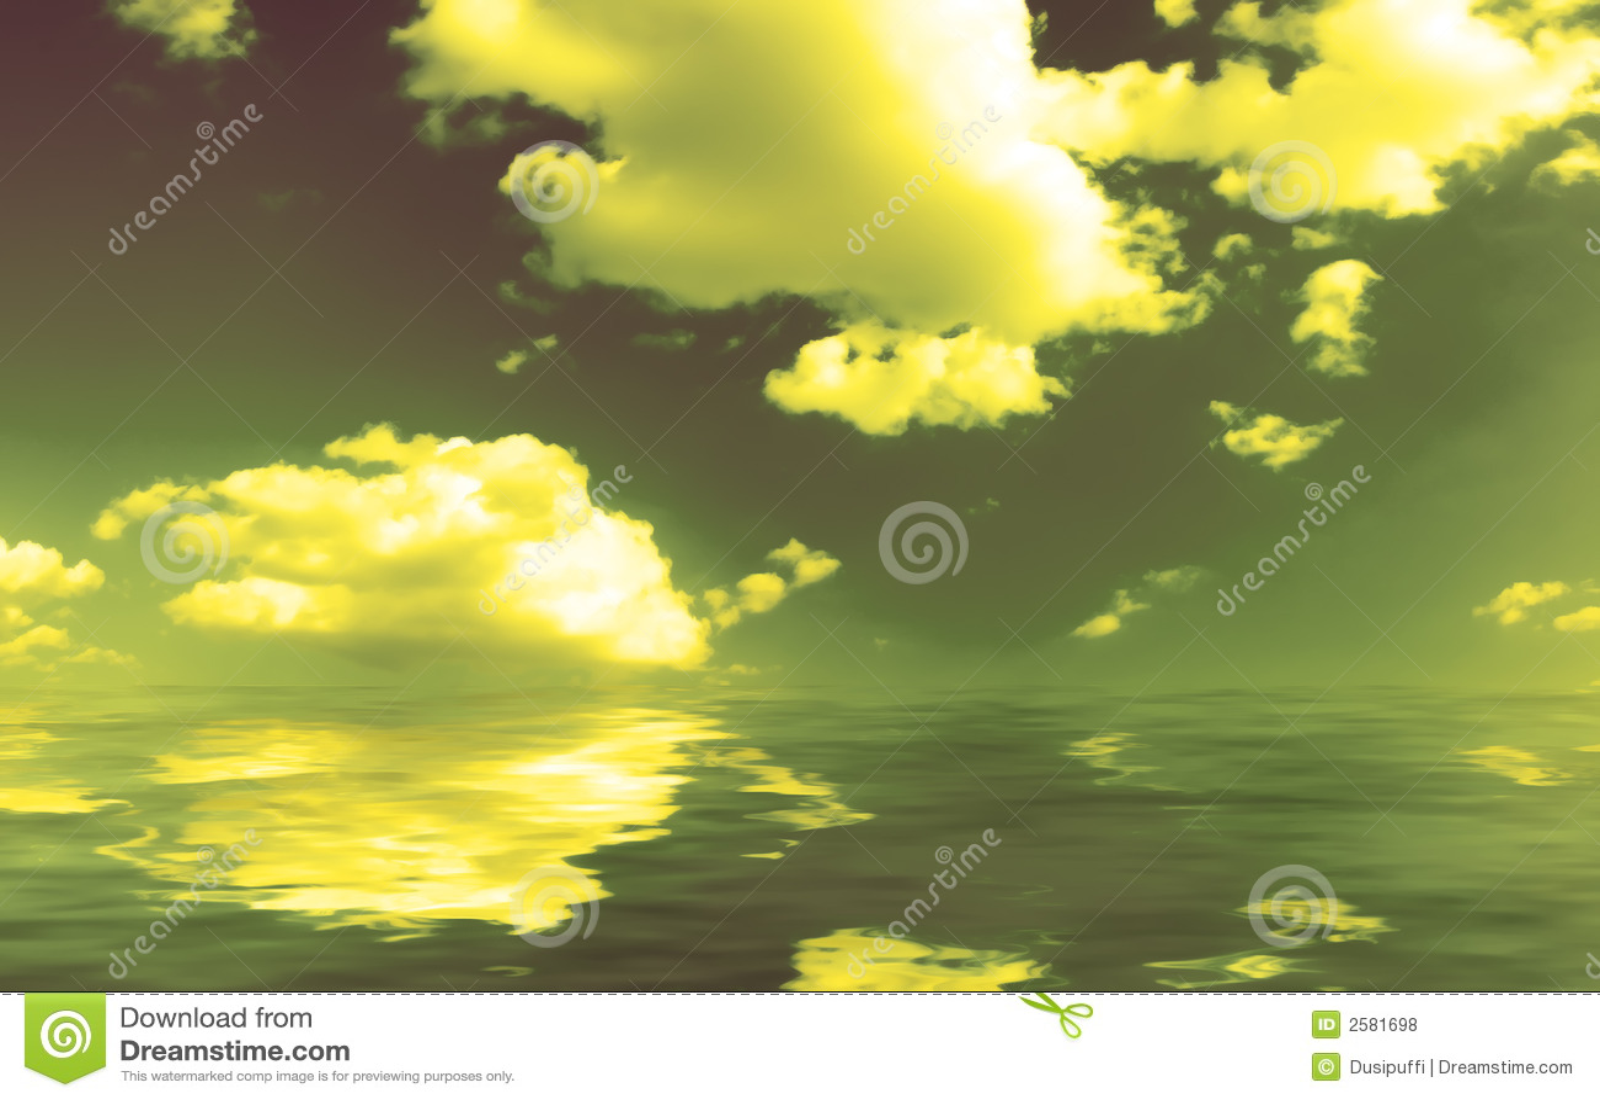 Panorama Of Cloudy Sky Royalty Free Stock Photos - Image ...